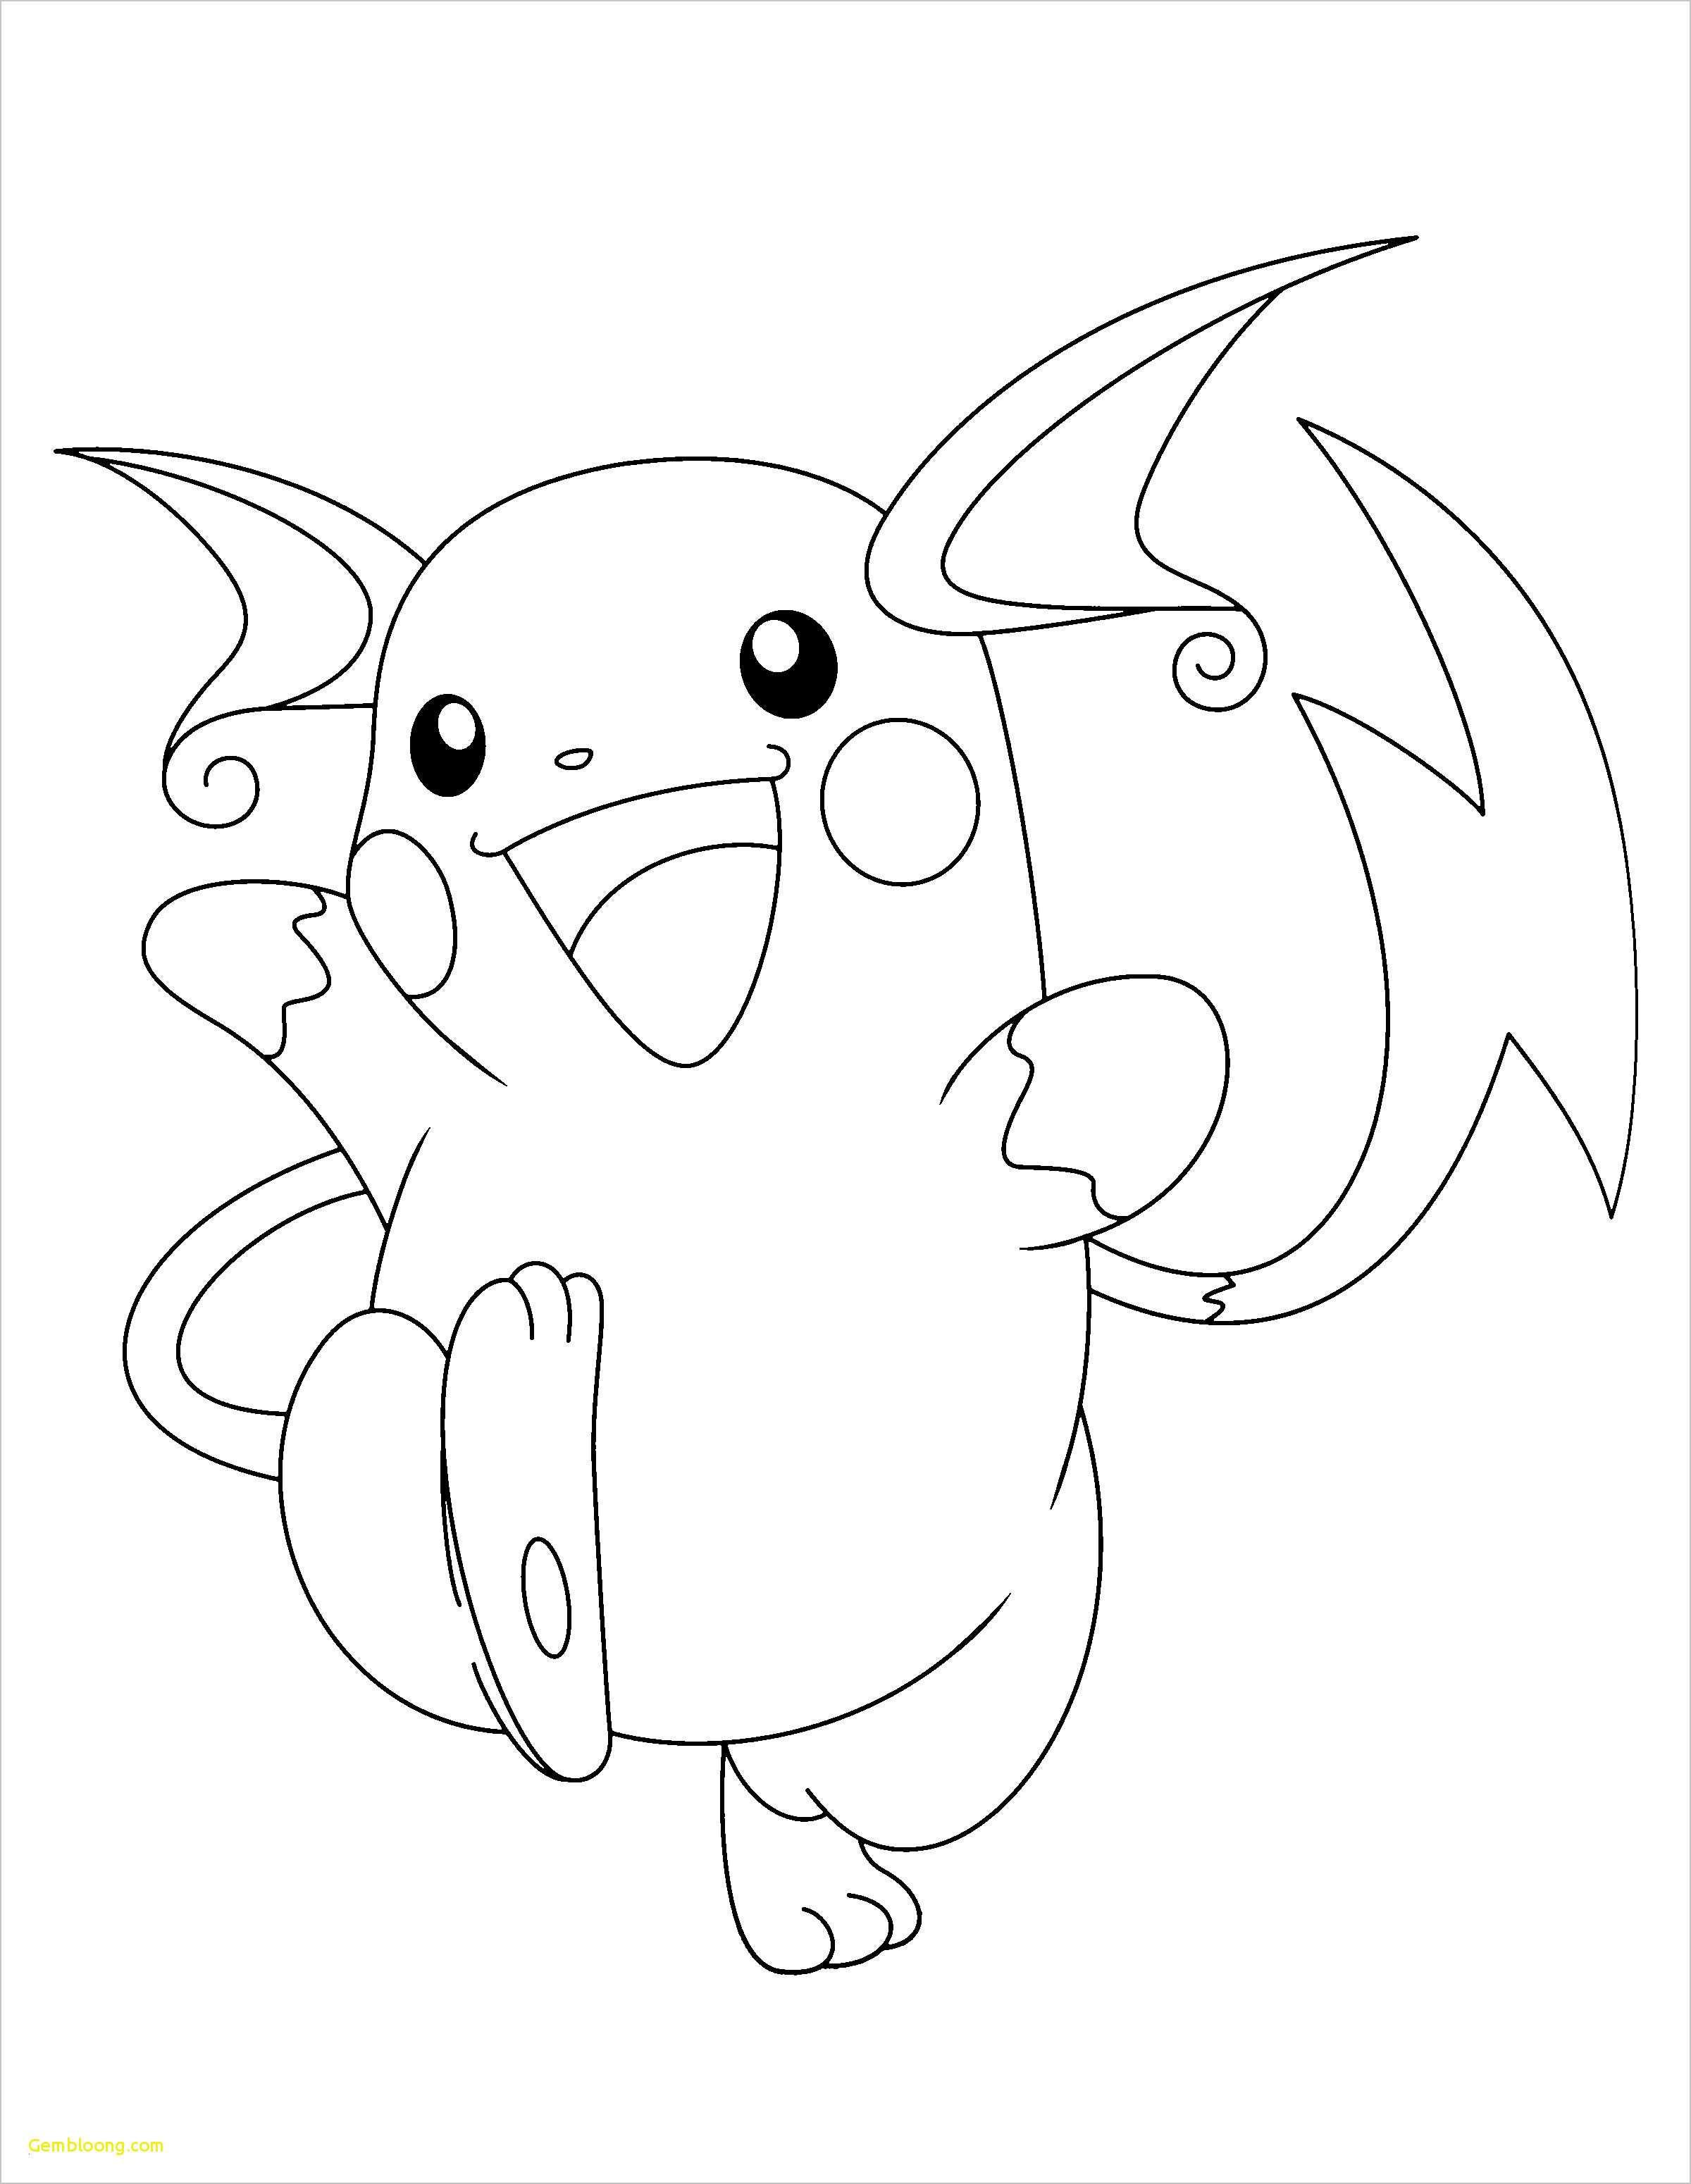 Ausmalbilder Pokemon Lucario Einzigartig Pokemon Ausmalbilder Pikachu Natürlich 45 Genial Pokemon Fotografieren